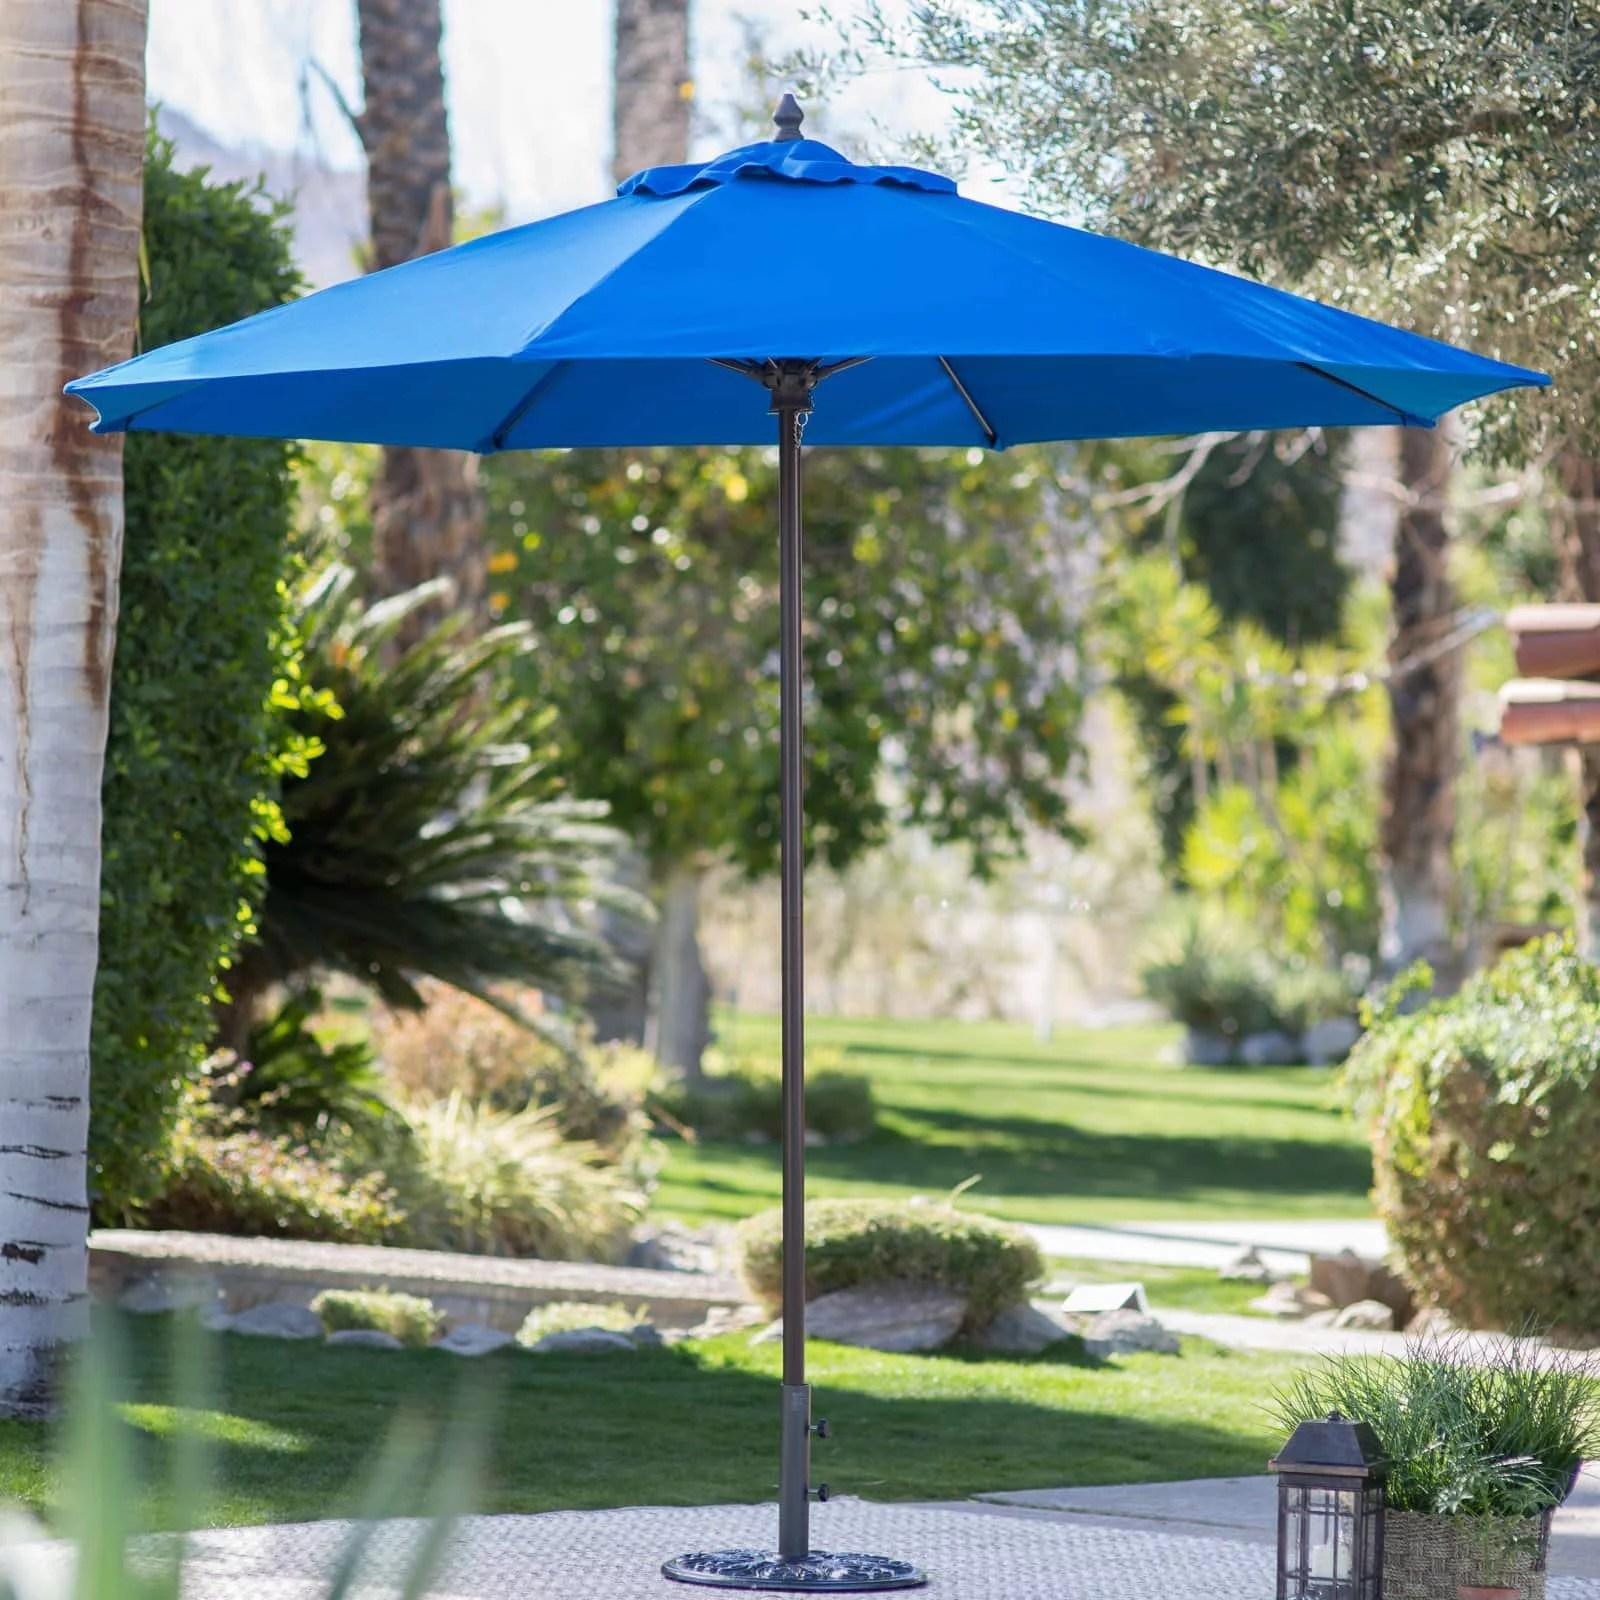 belham living 9 ft sunbrella commercial grade aluminum wind resistant patio umbrella